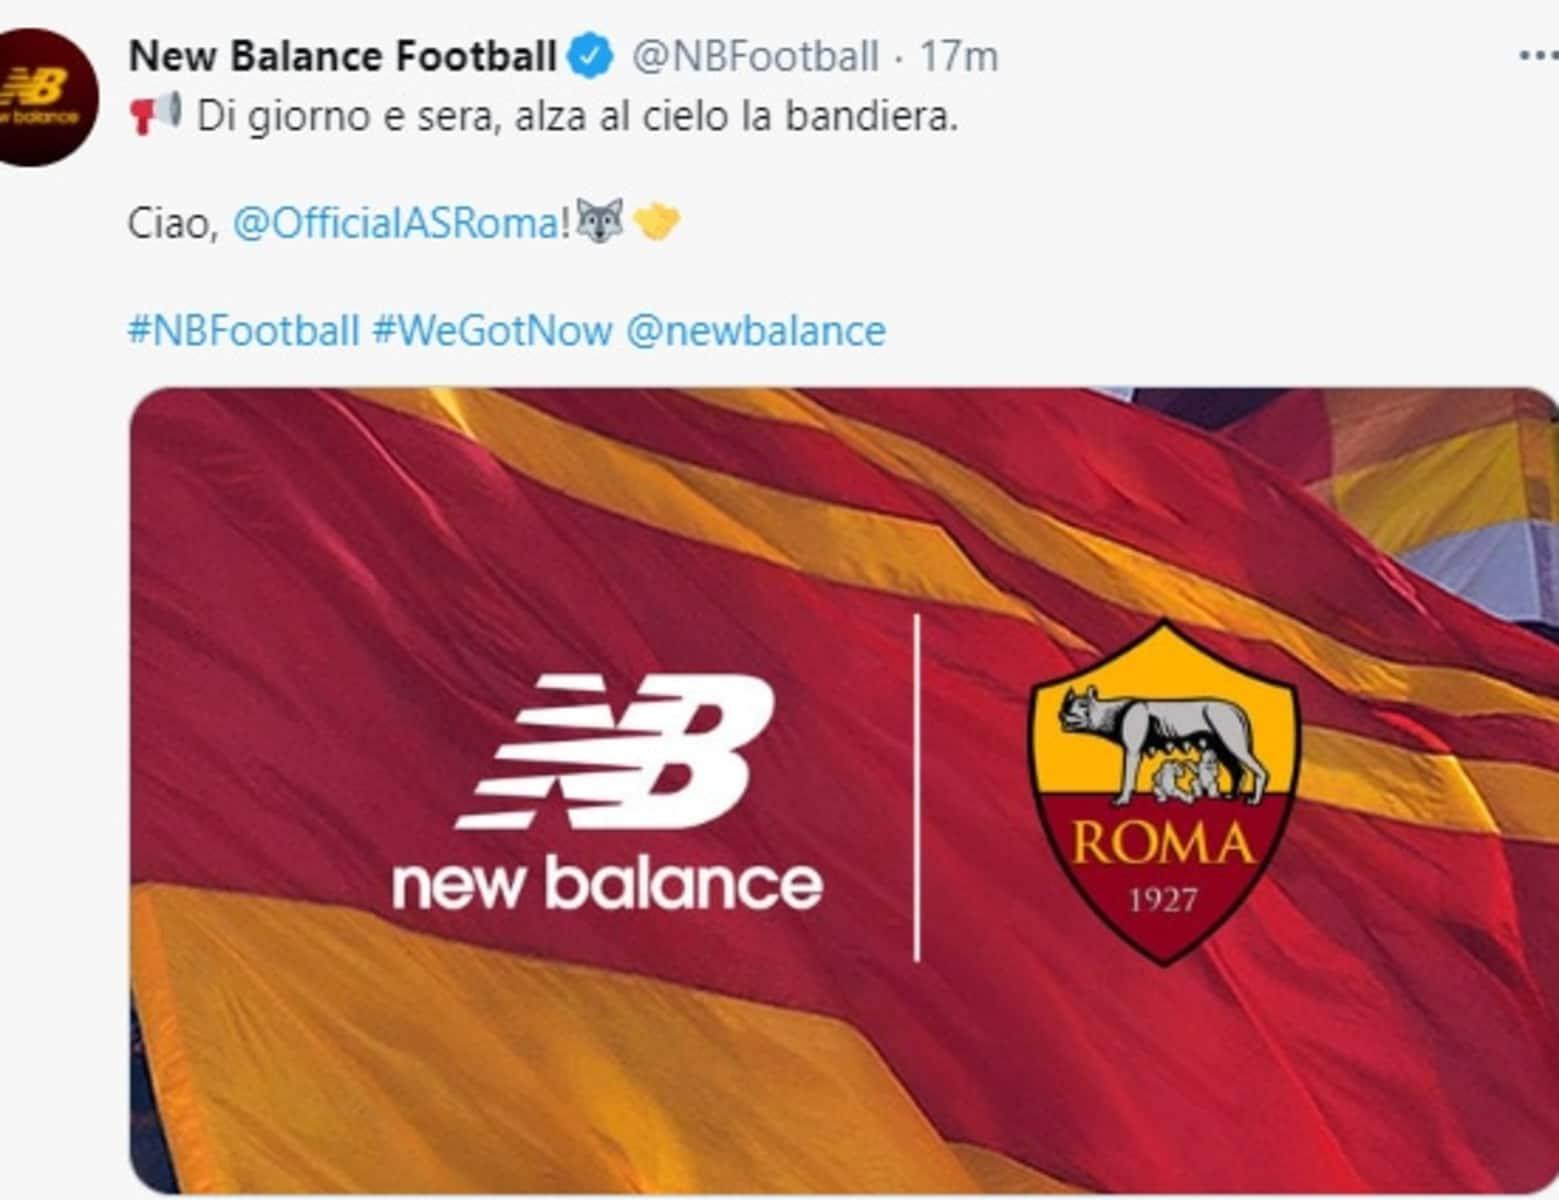 Roma, New Balance e il tweet da Curva Sud: tifosi pazzi